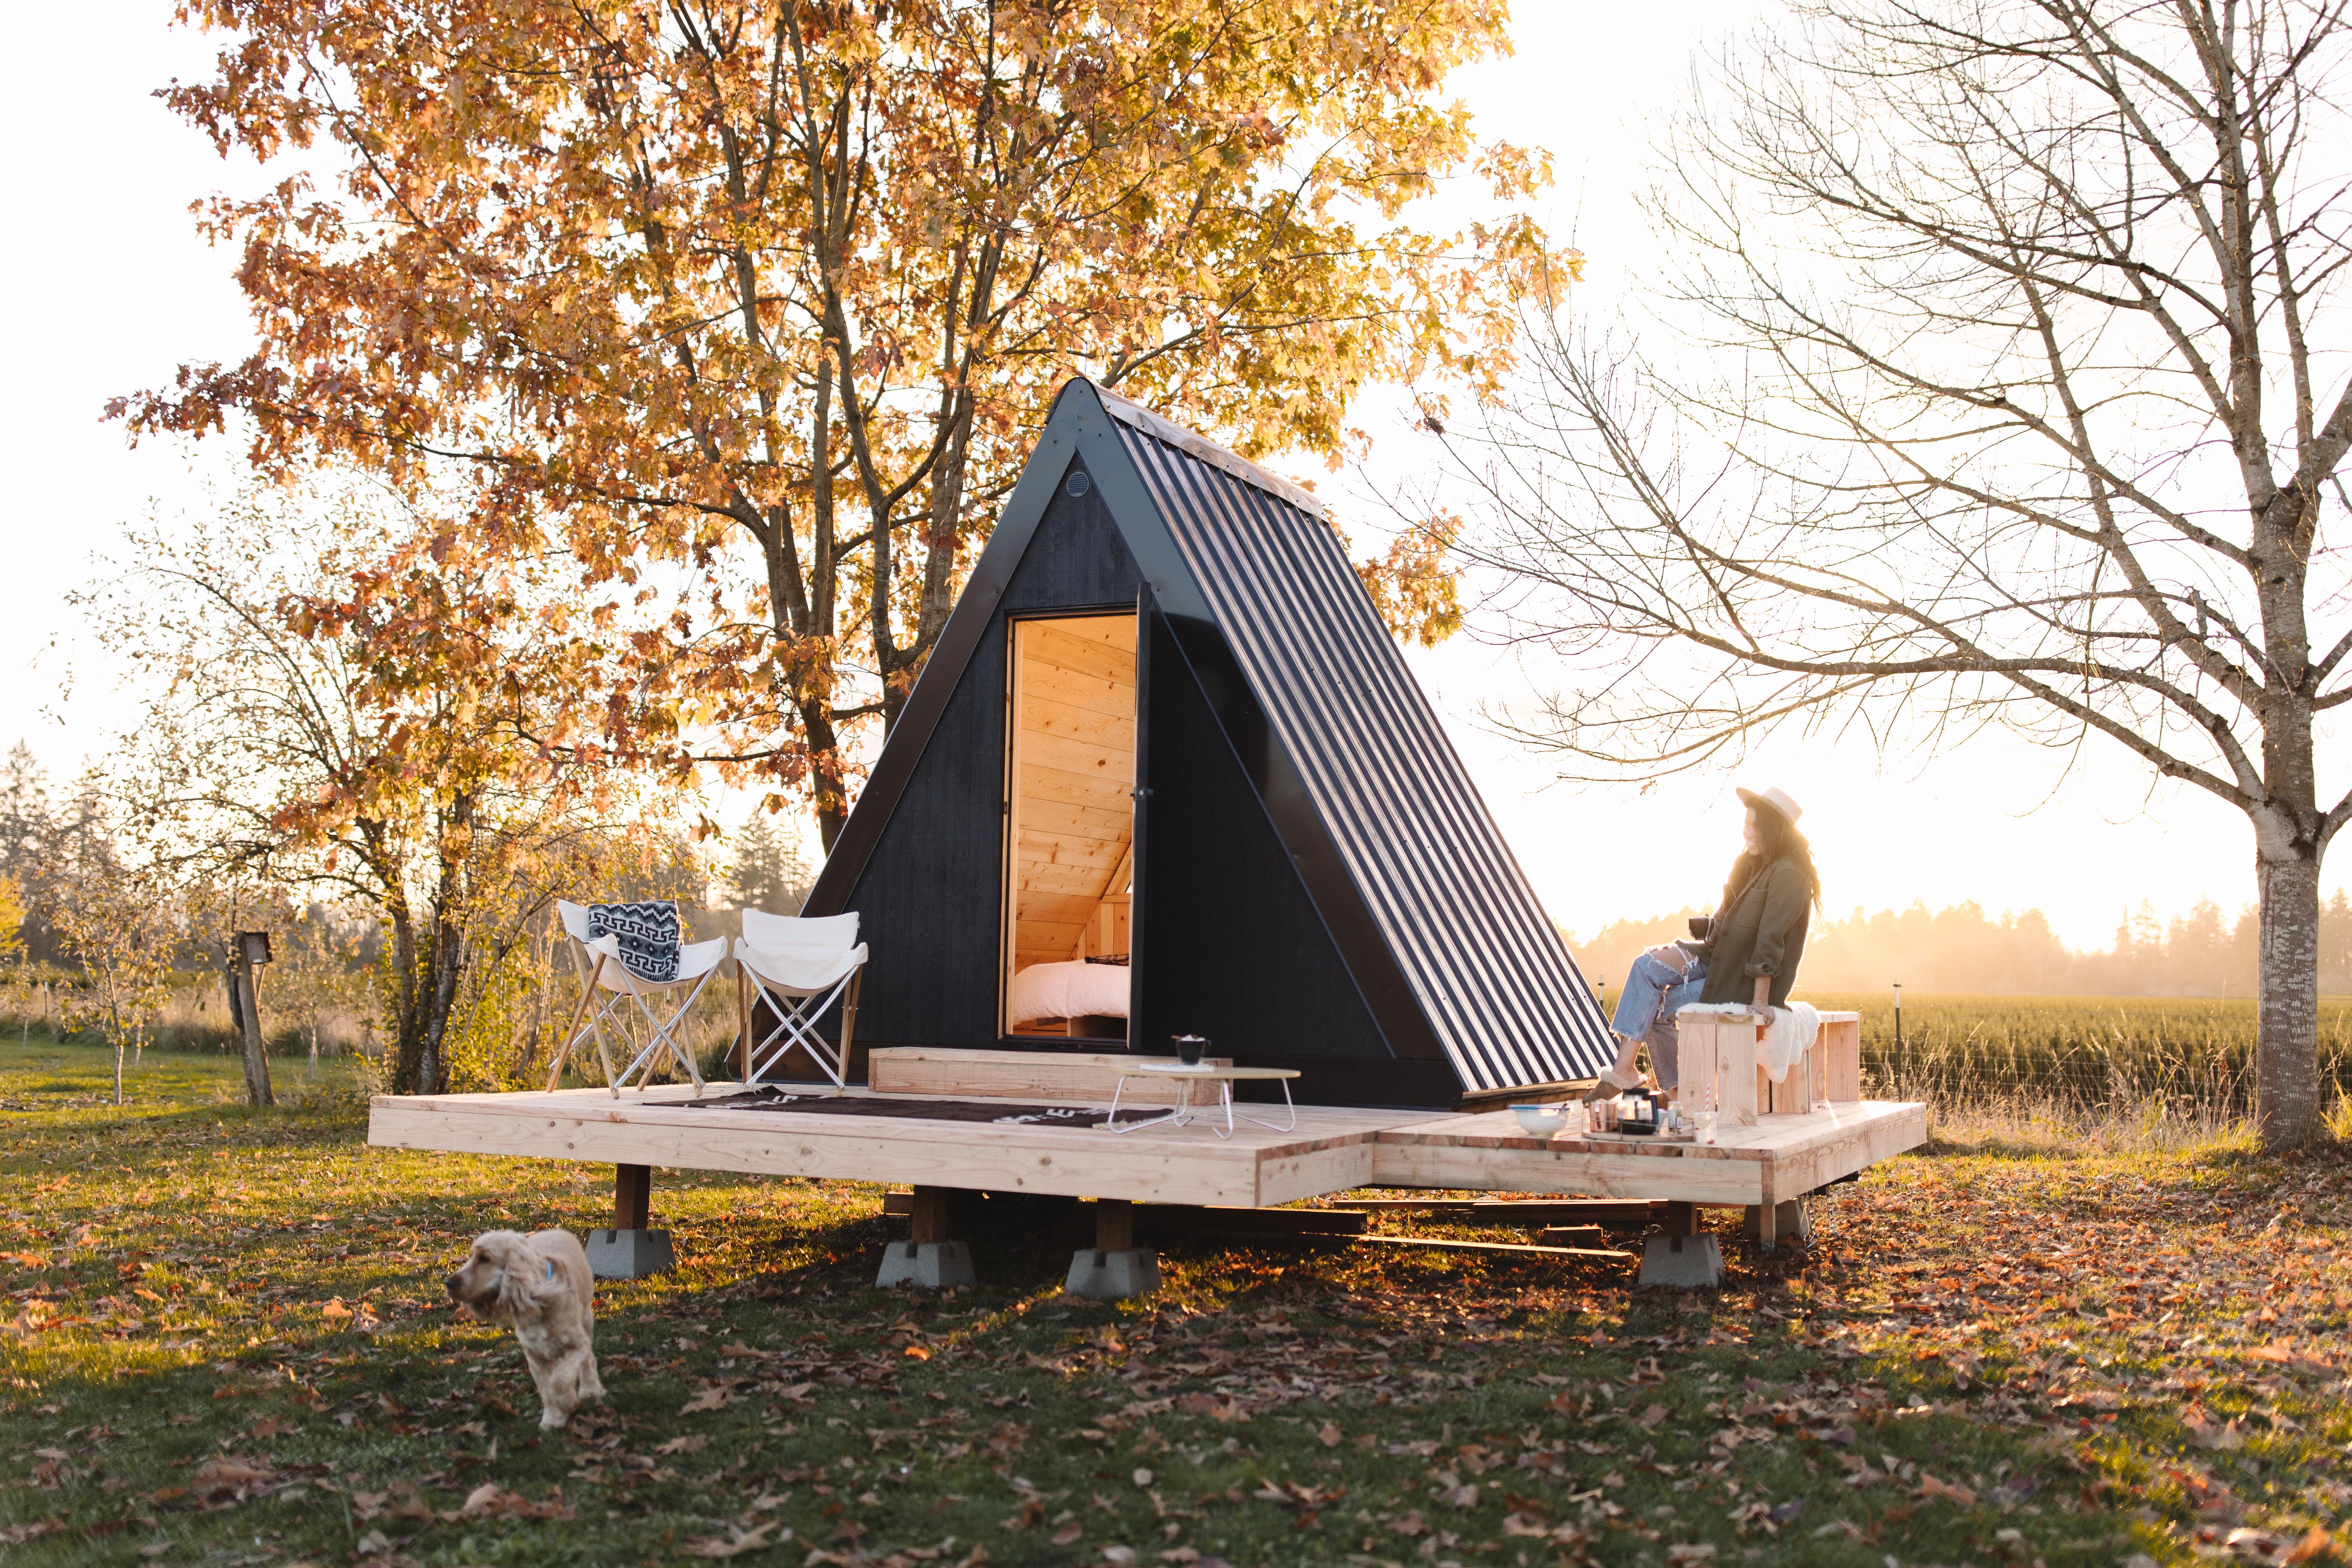 The Bivvi Cabin's optional extras include a small deck area